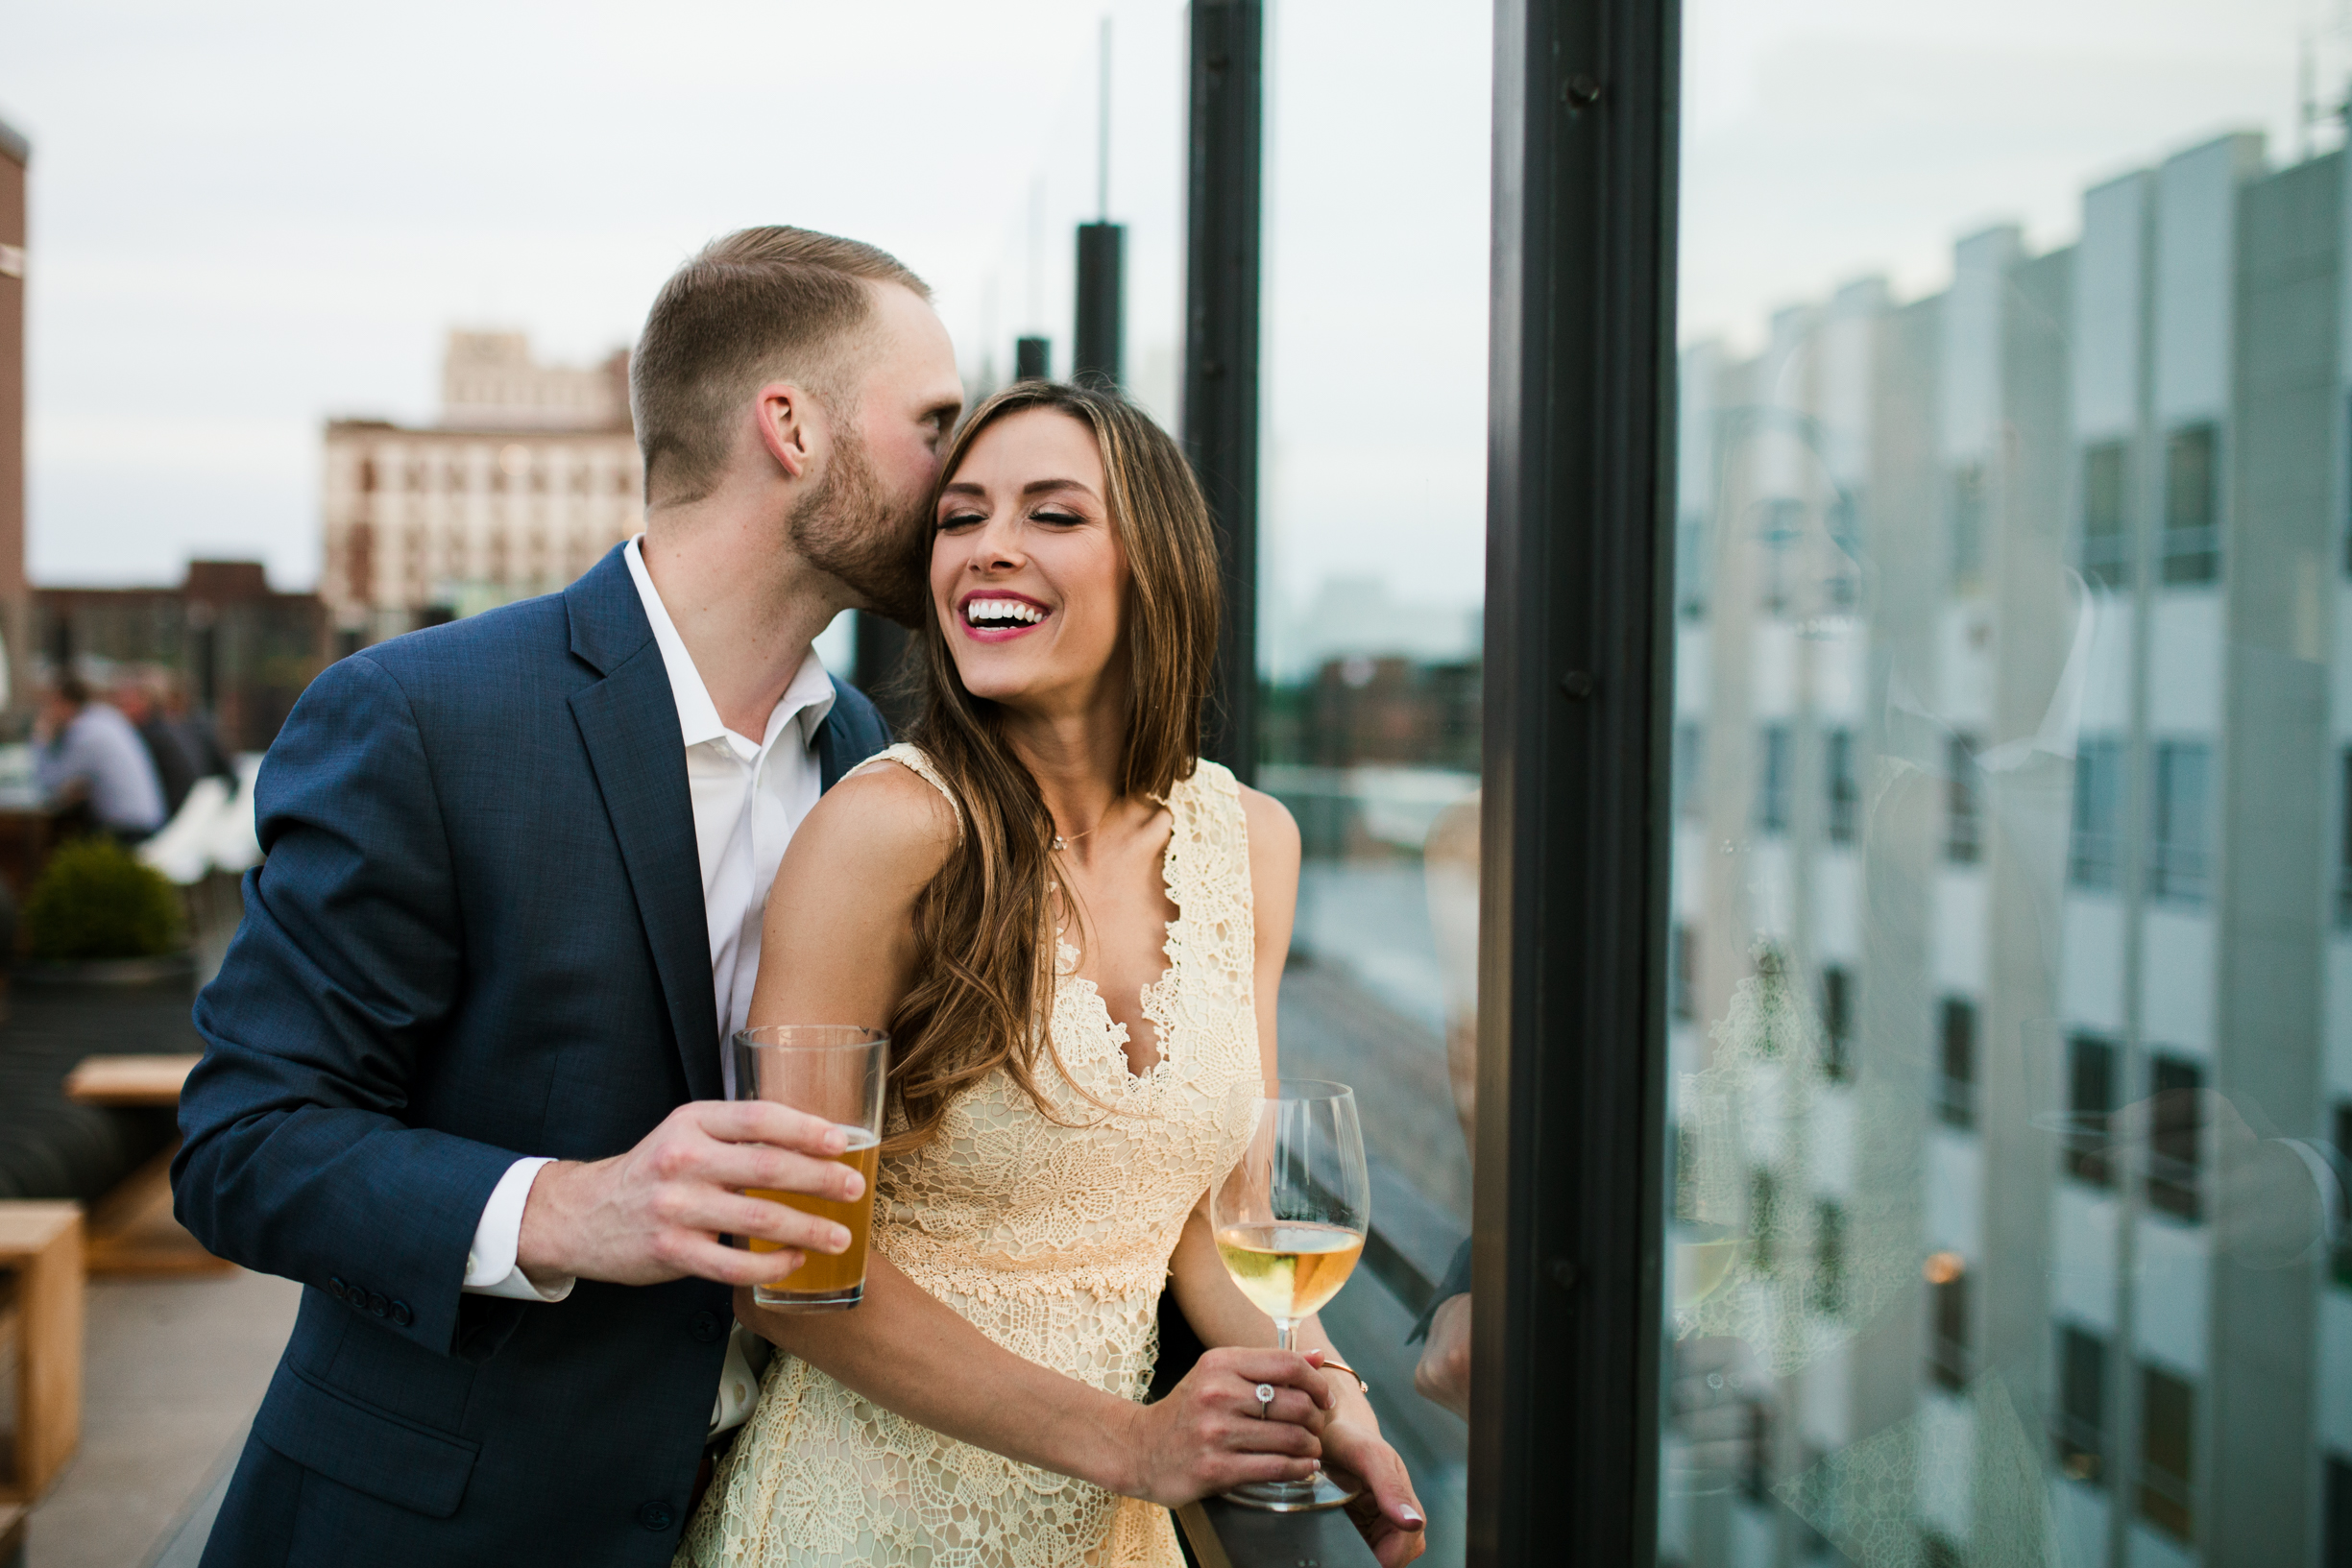 Victoria & Chad Engagement 2018 Crystal Ludwick Photo Louisville Kentucky Wedding Photographer WEBSITE (19 of 48).jpg